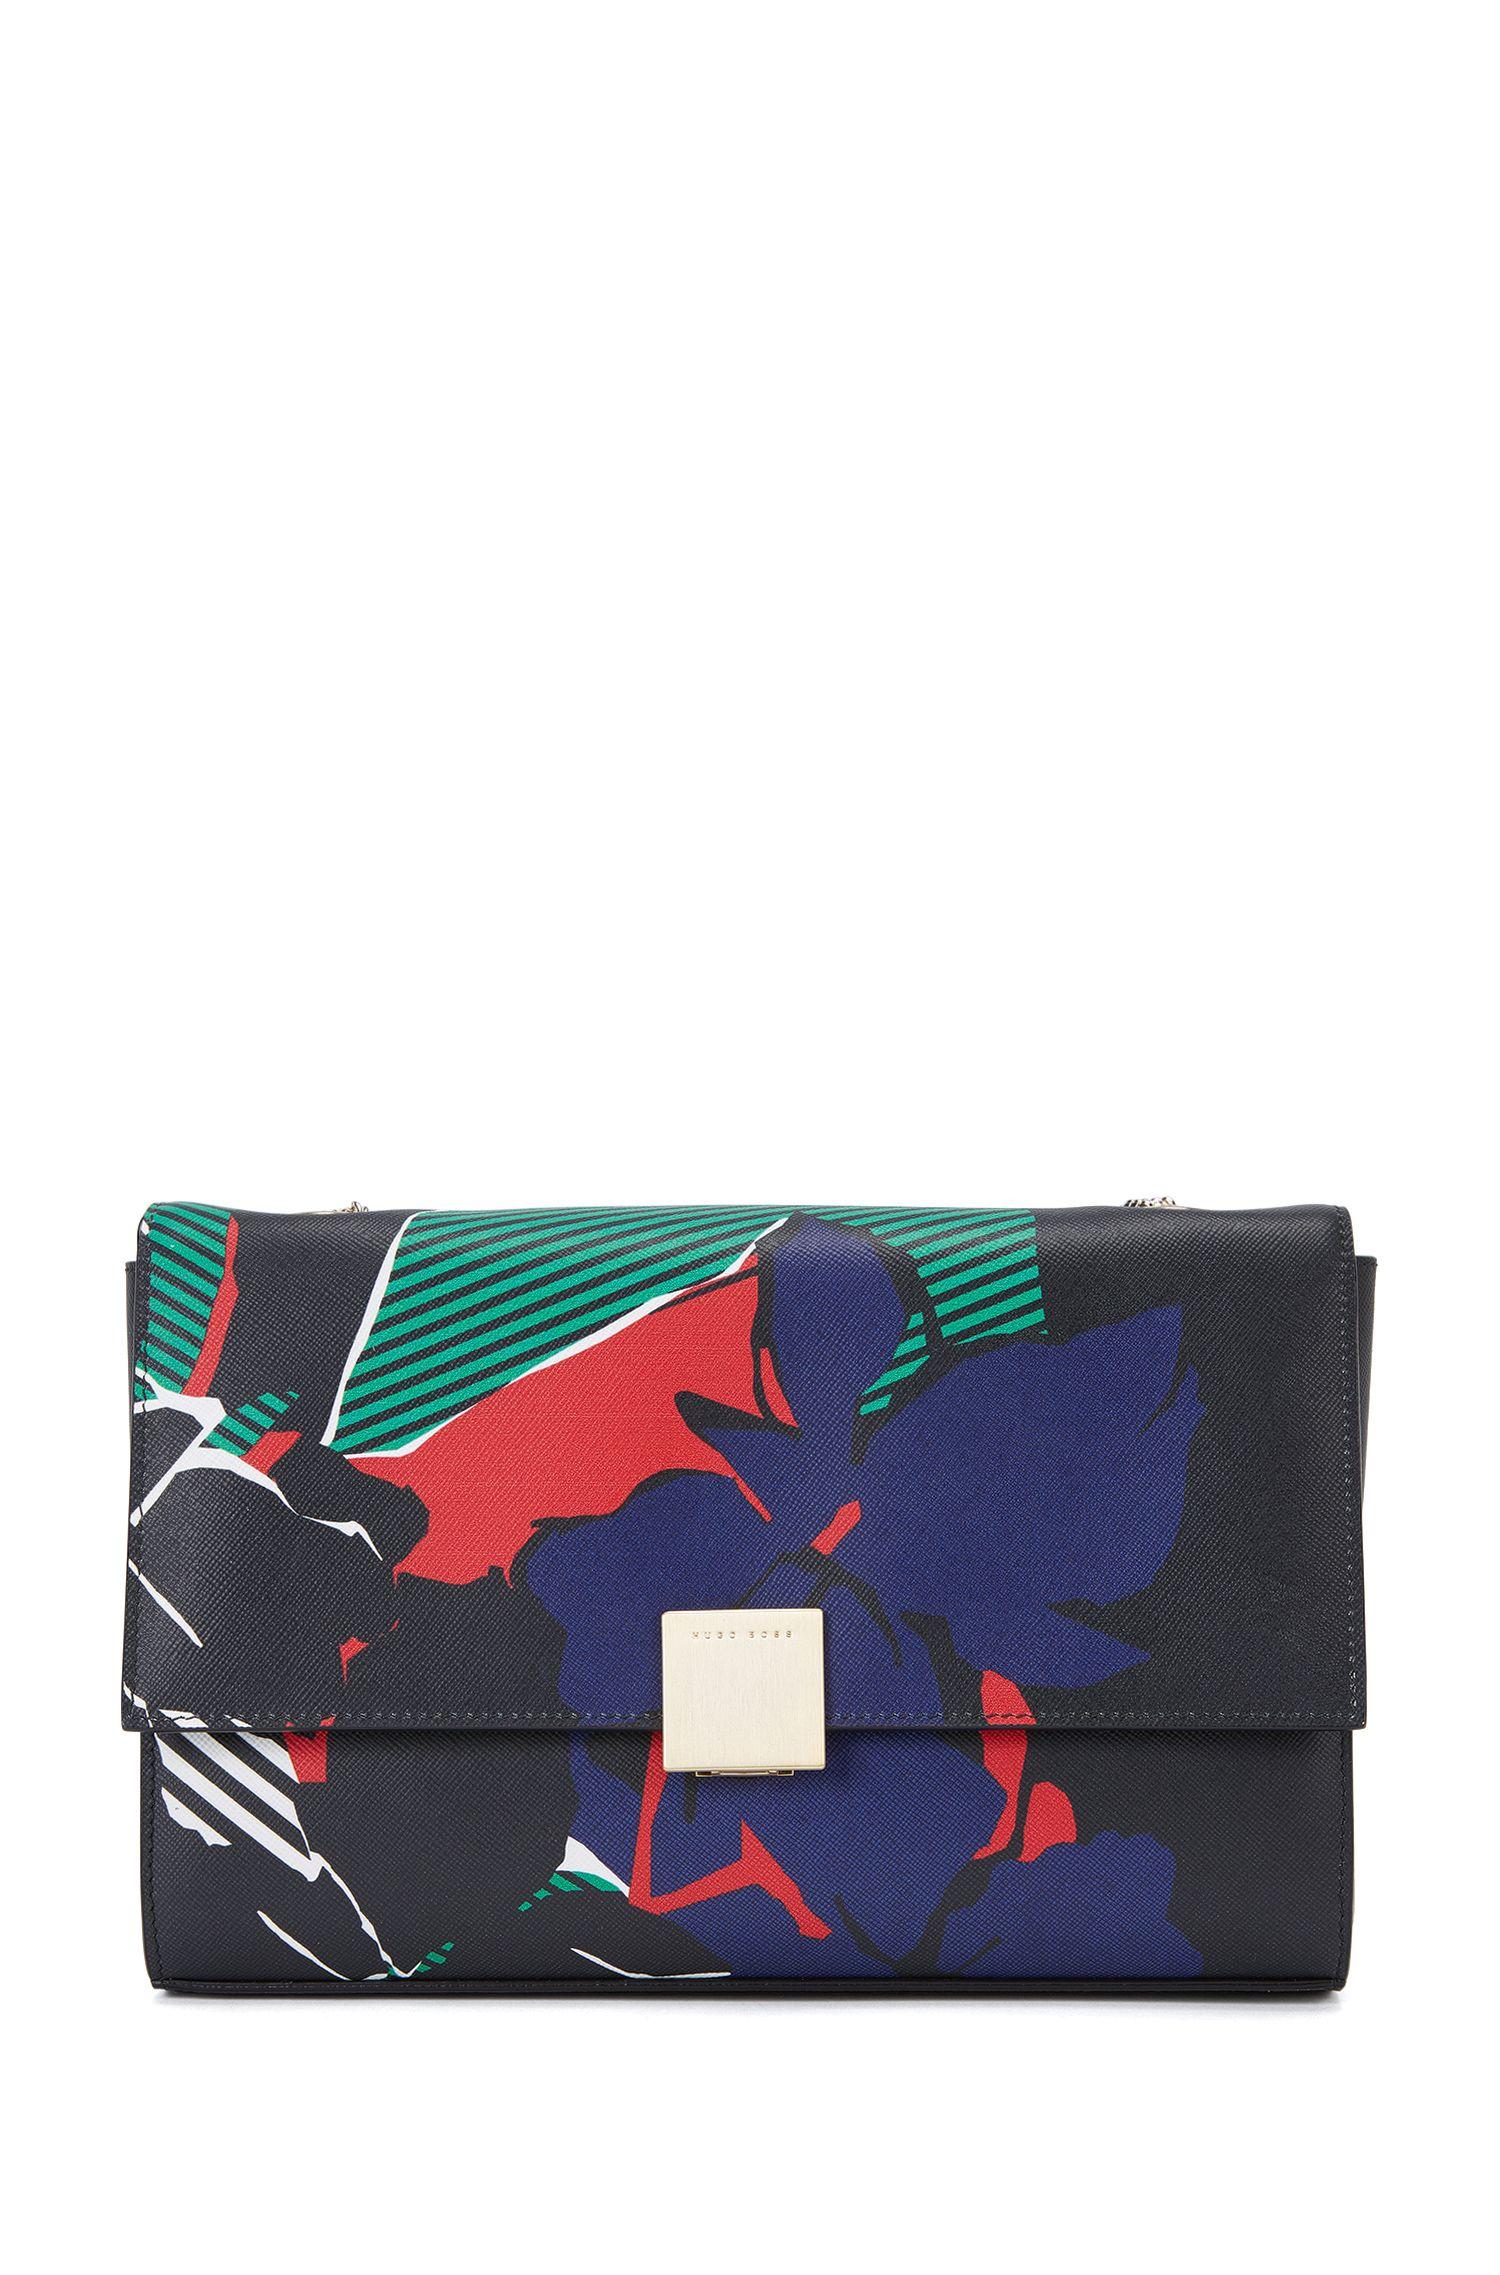 'Munich Flap FL' | Italian Calfskin Printed Handbag, Chain Strap